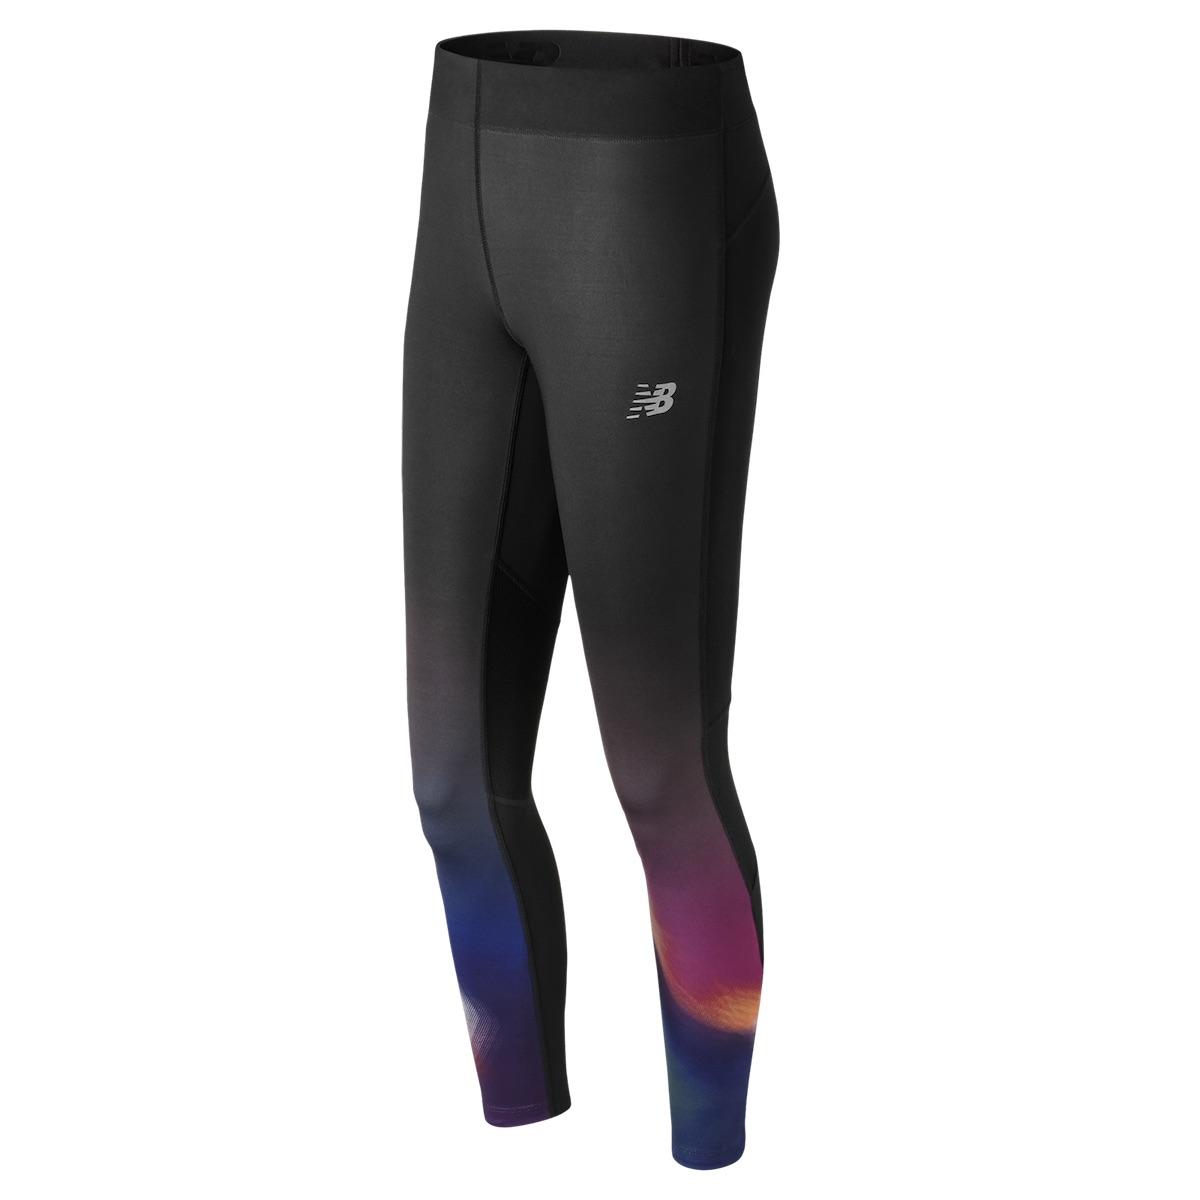 New Balance - Impact Premium Print Tigh - Running pants - Women's